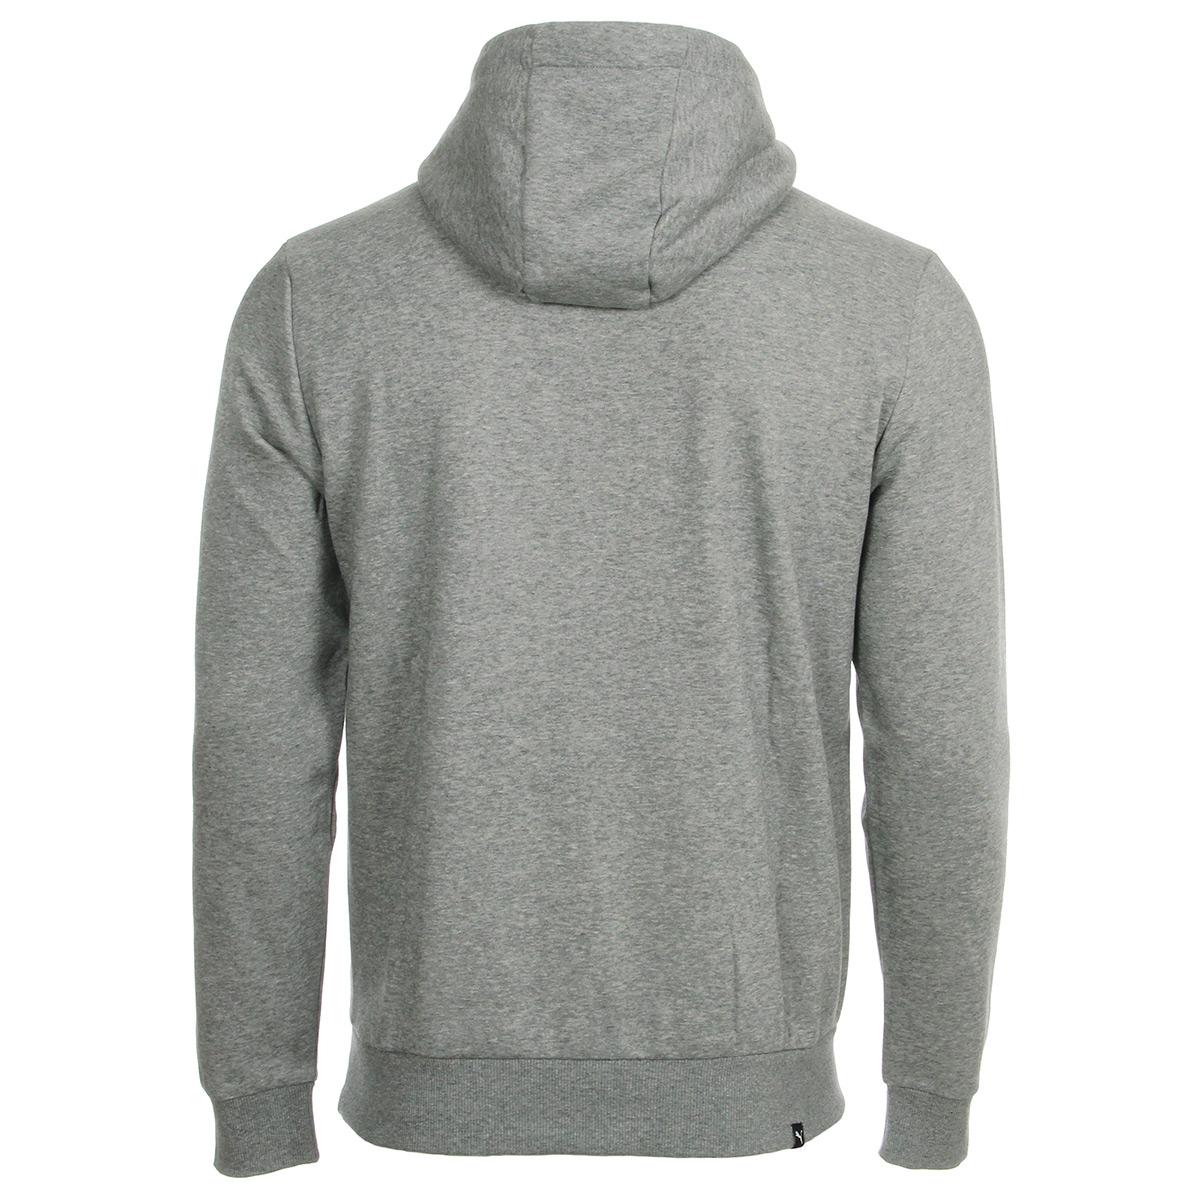 Puma ESS No.1 Hoody Fl Grey 83825703, Sweats homme